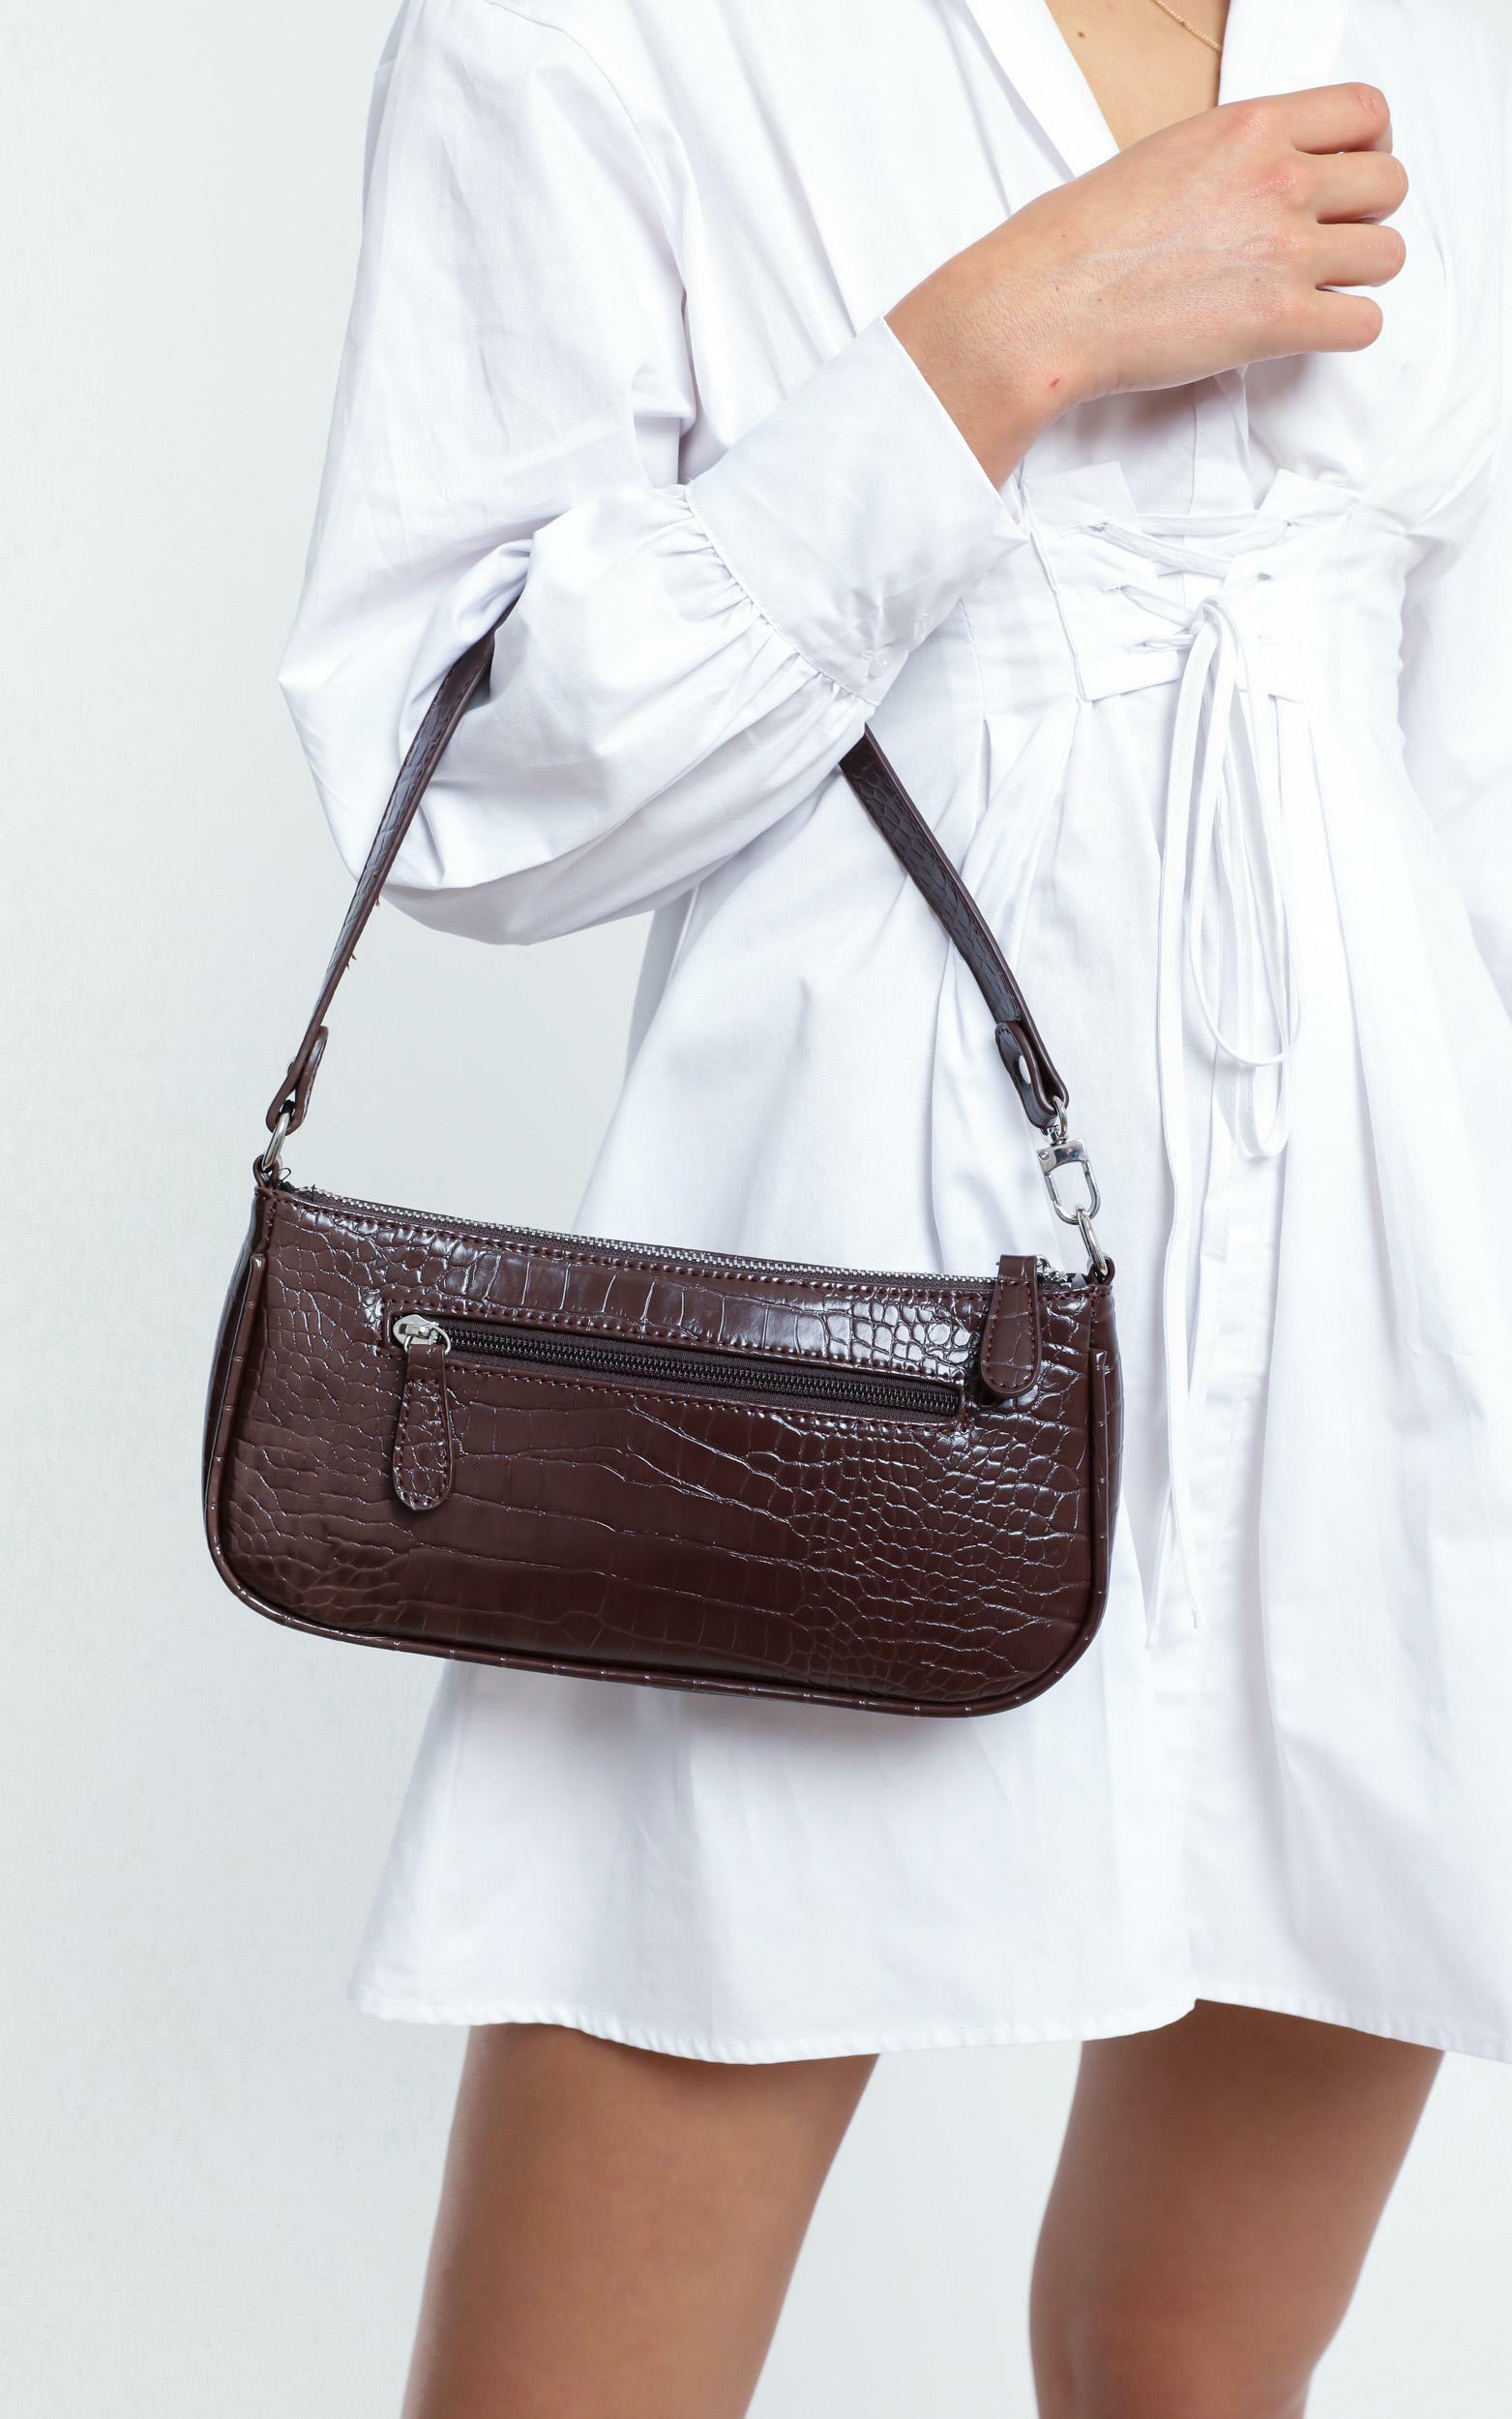 Save My Love Bag in Chocolate Croc, BRN1, hi-res image number null